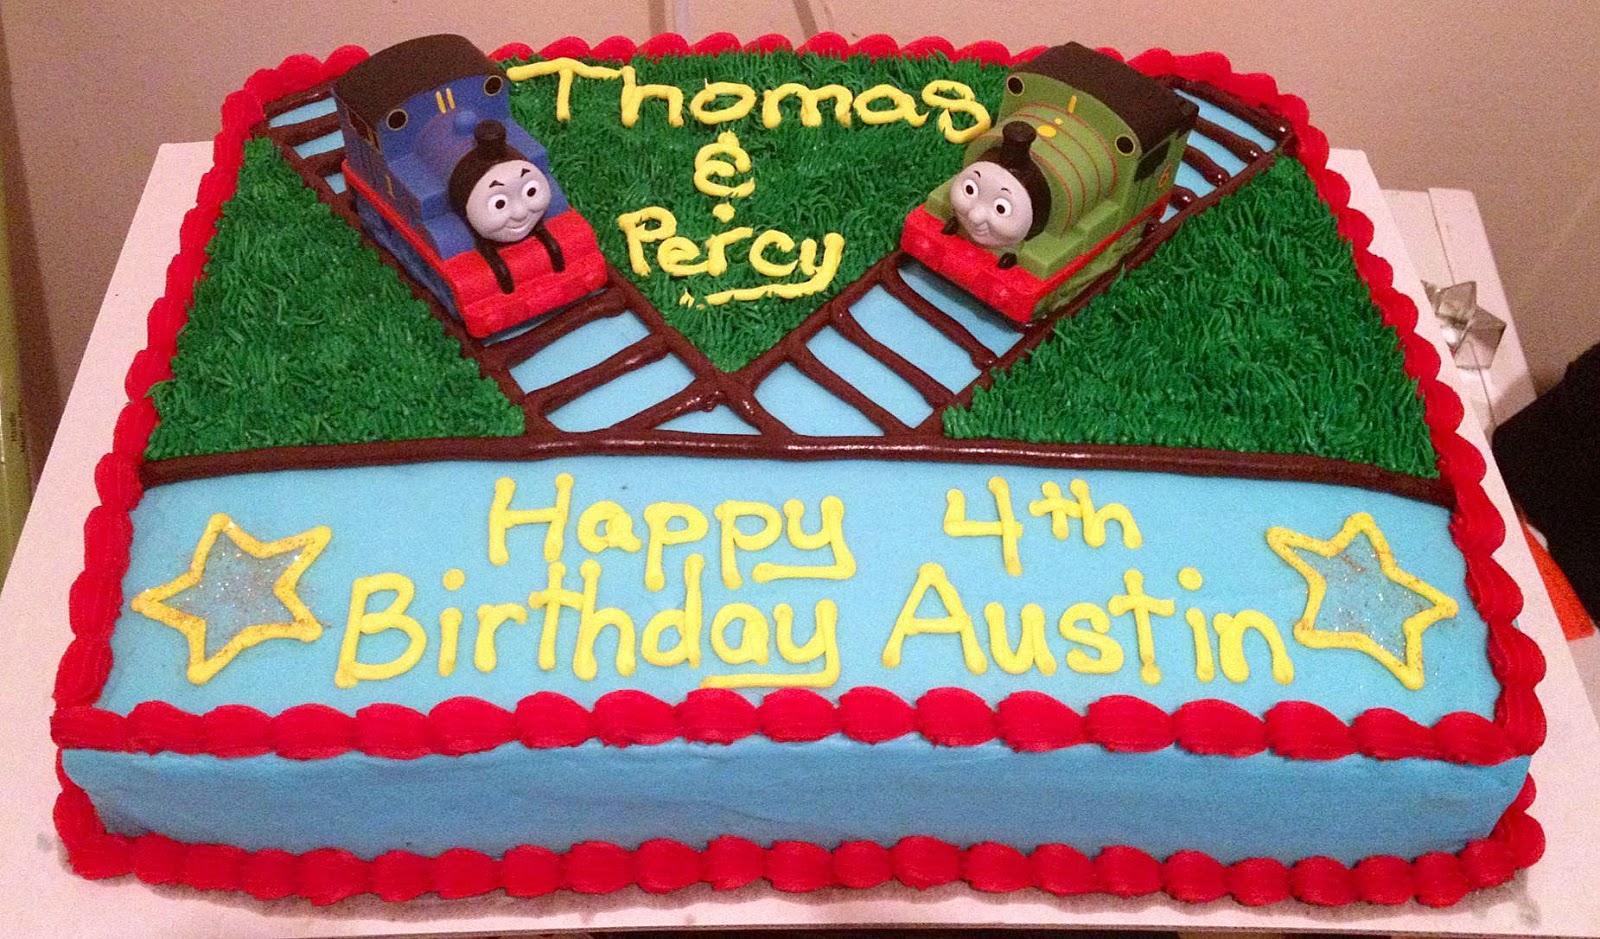 Babycakes Bake Shop Austins Thomas Friends Cake